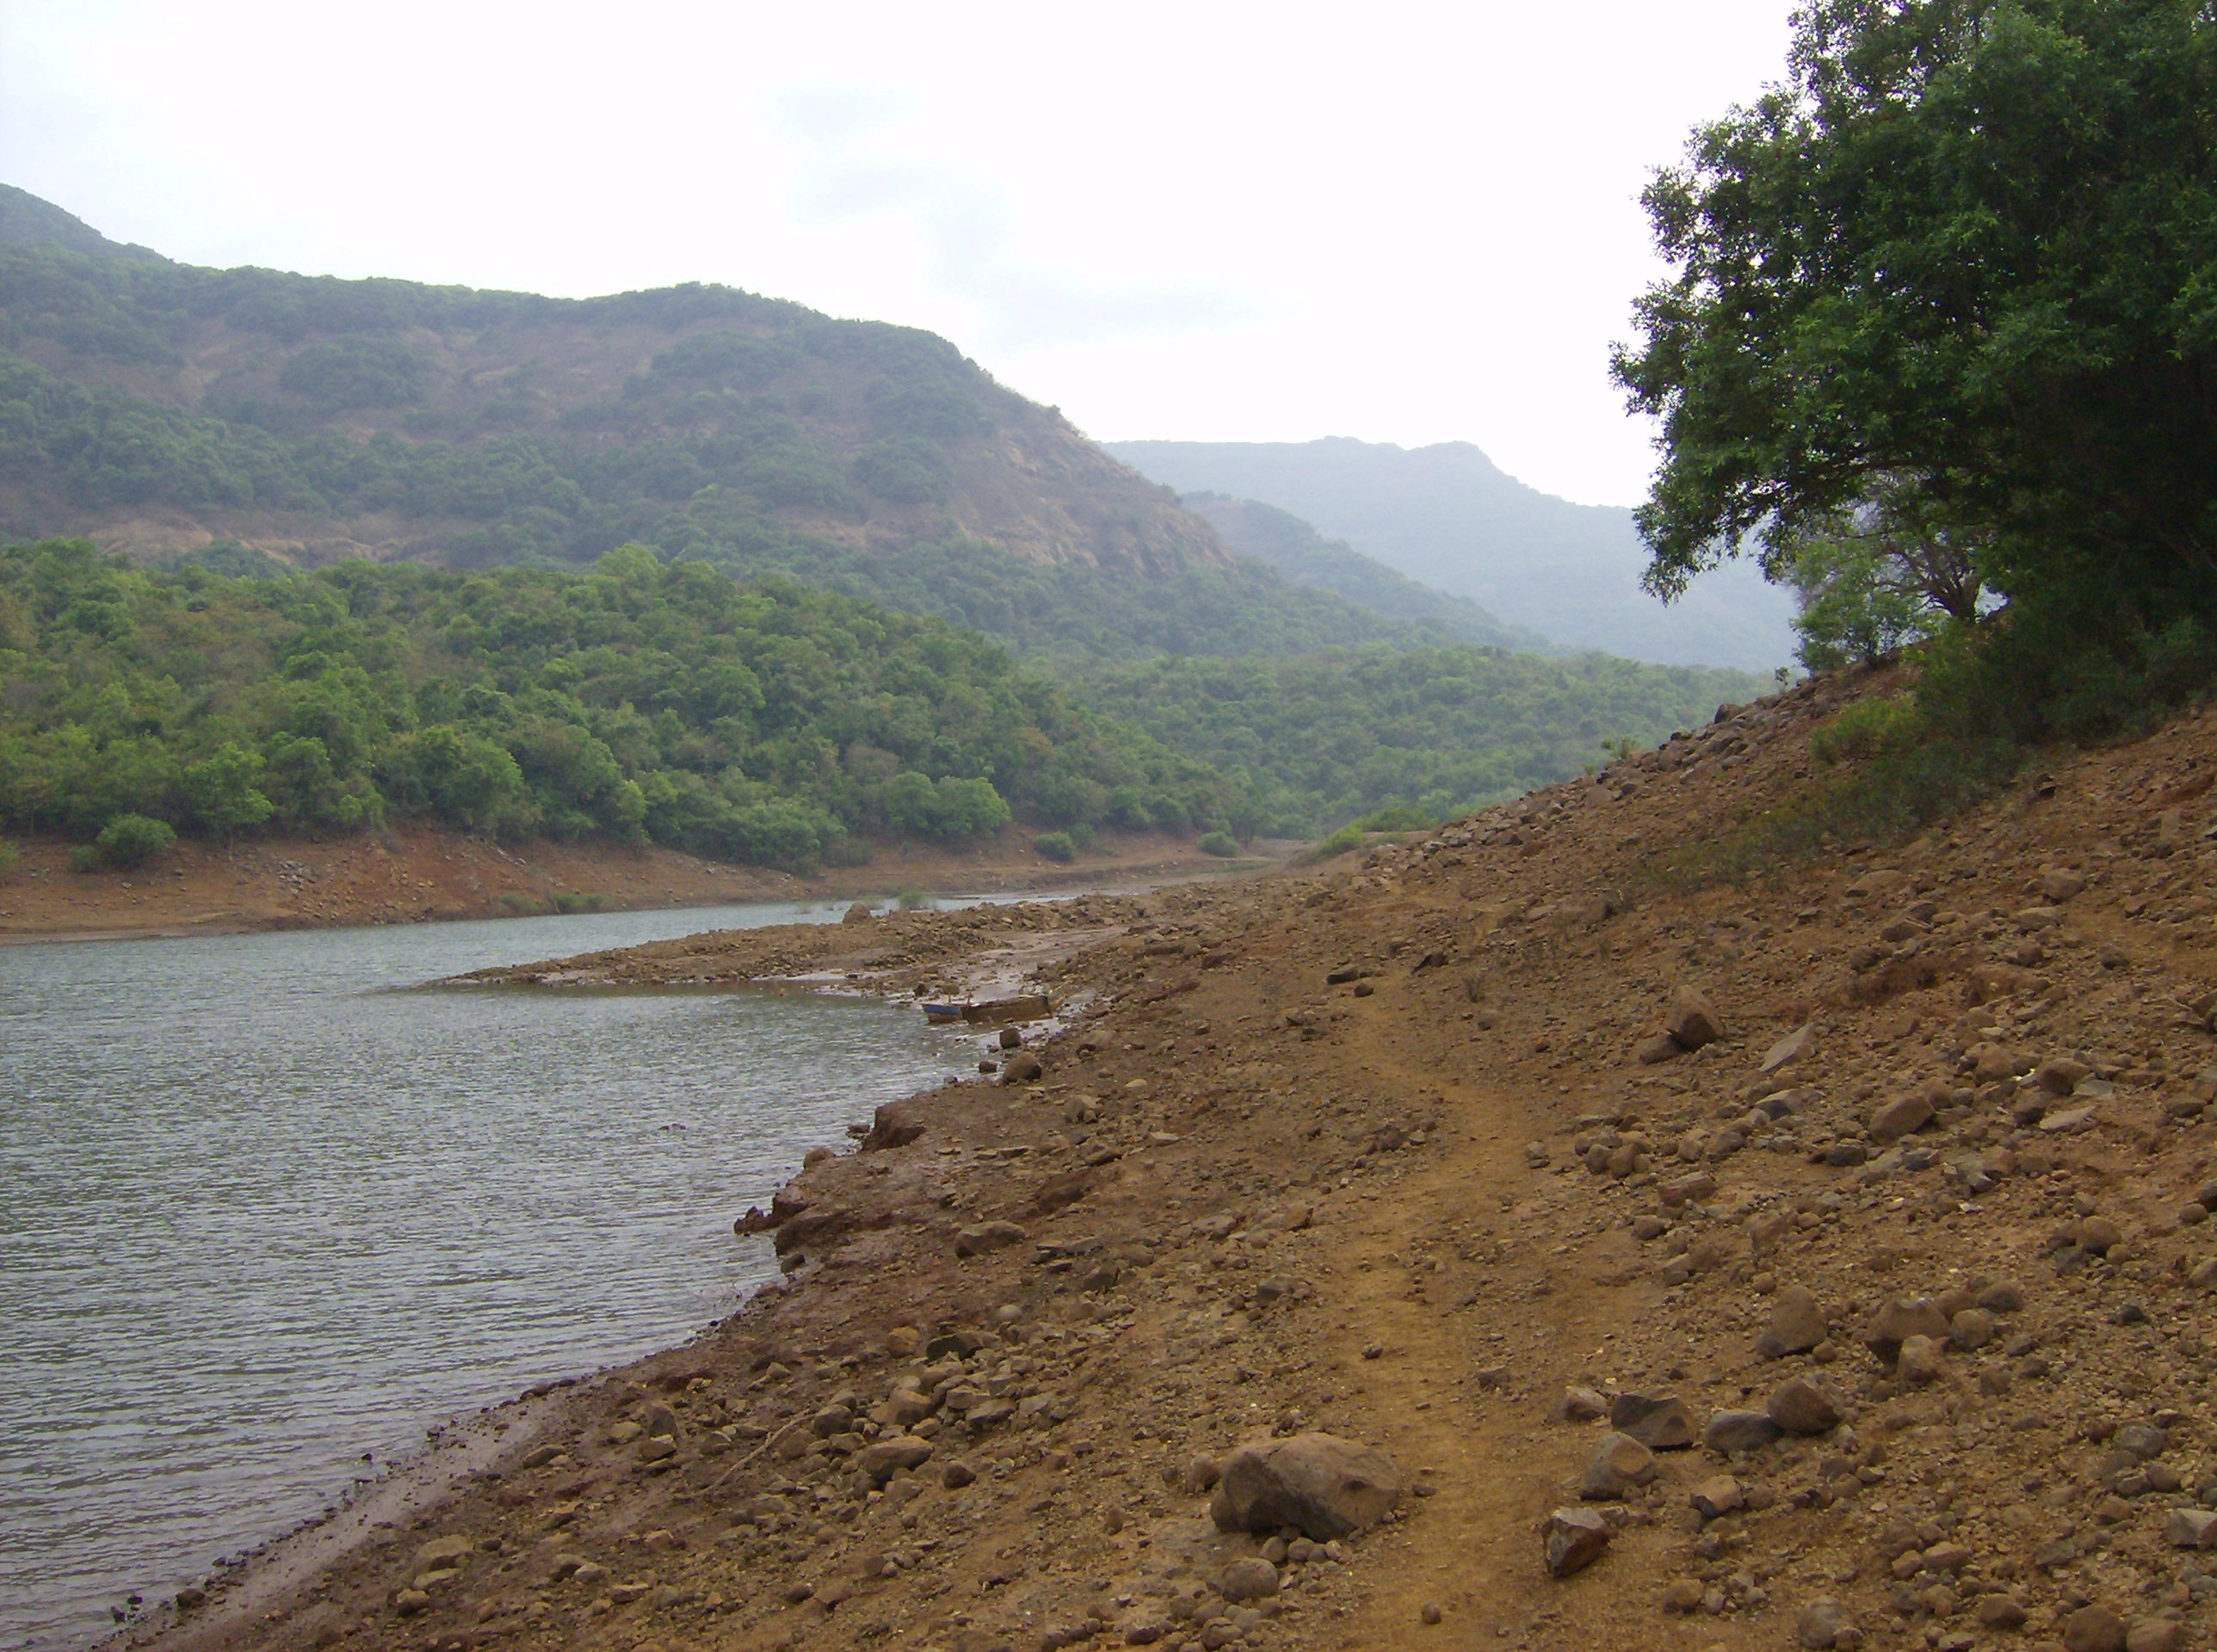 Dry landscape photo